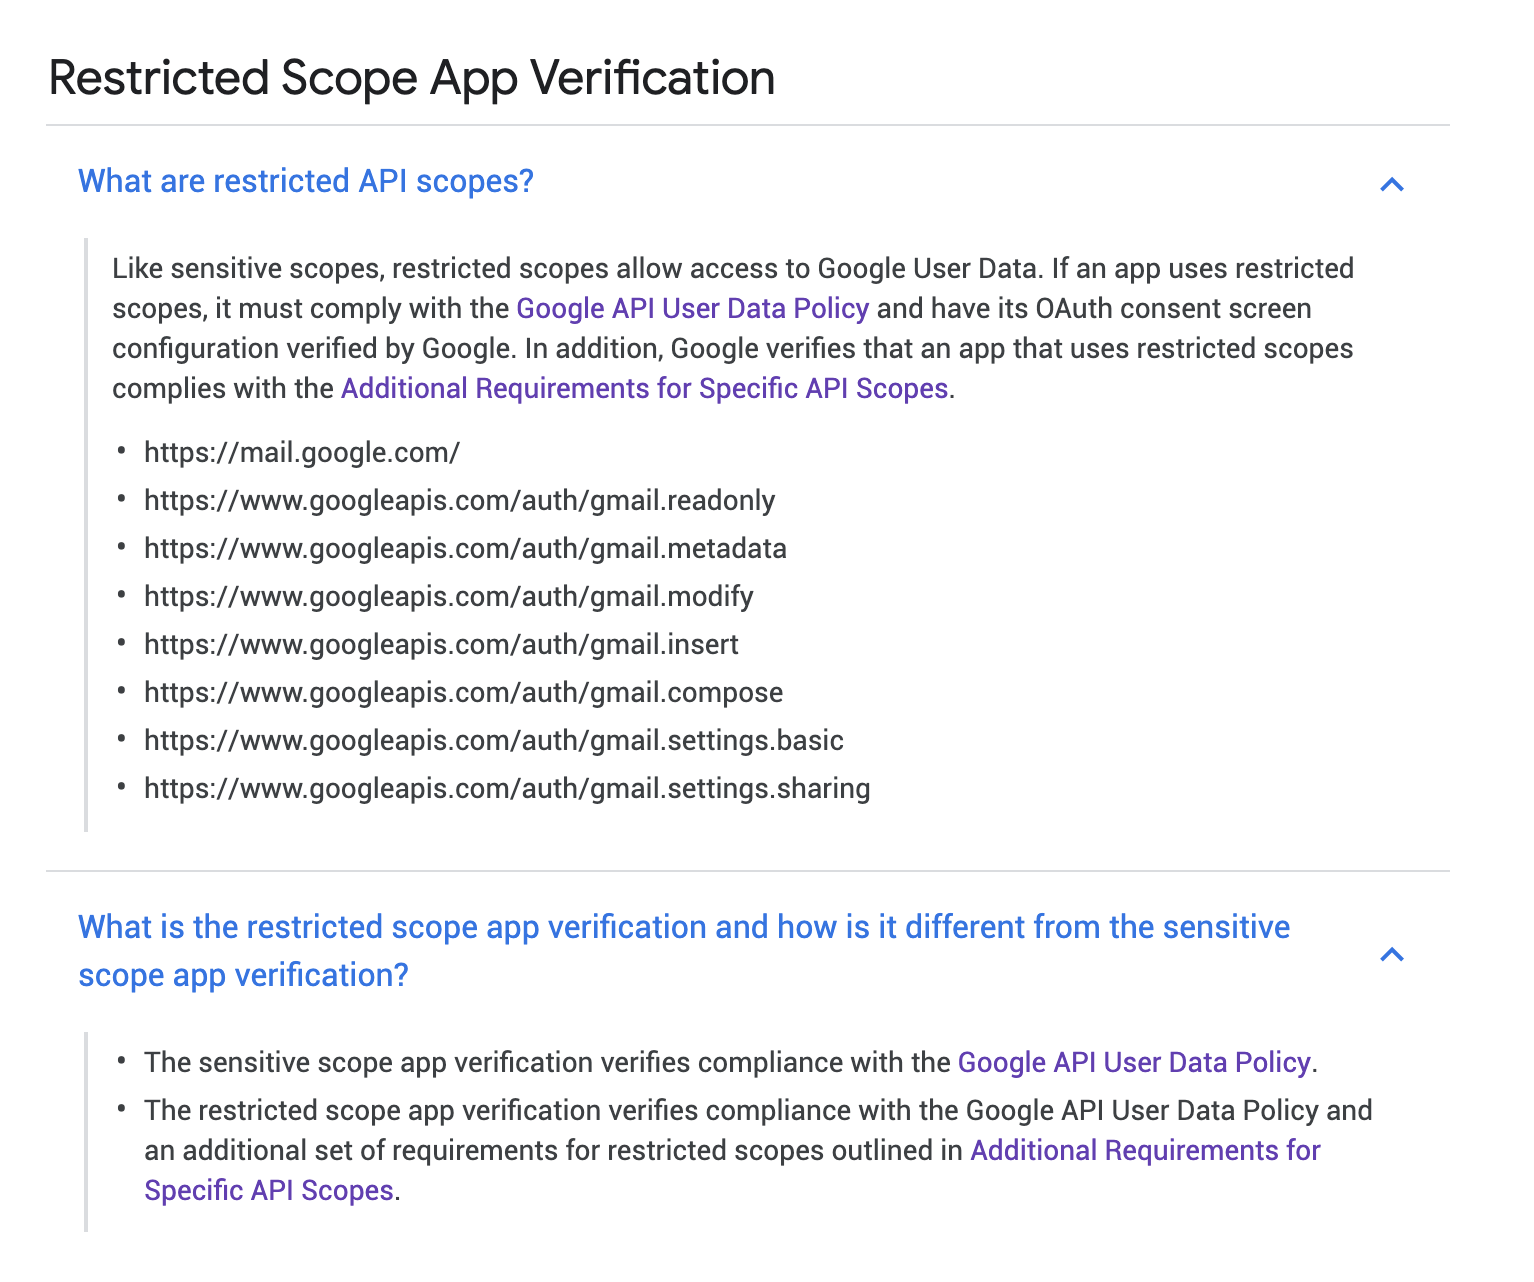 My feelings on Google's $15,000-$75,000 OAuth verification